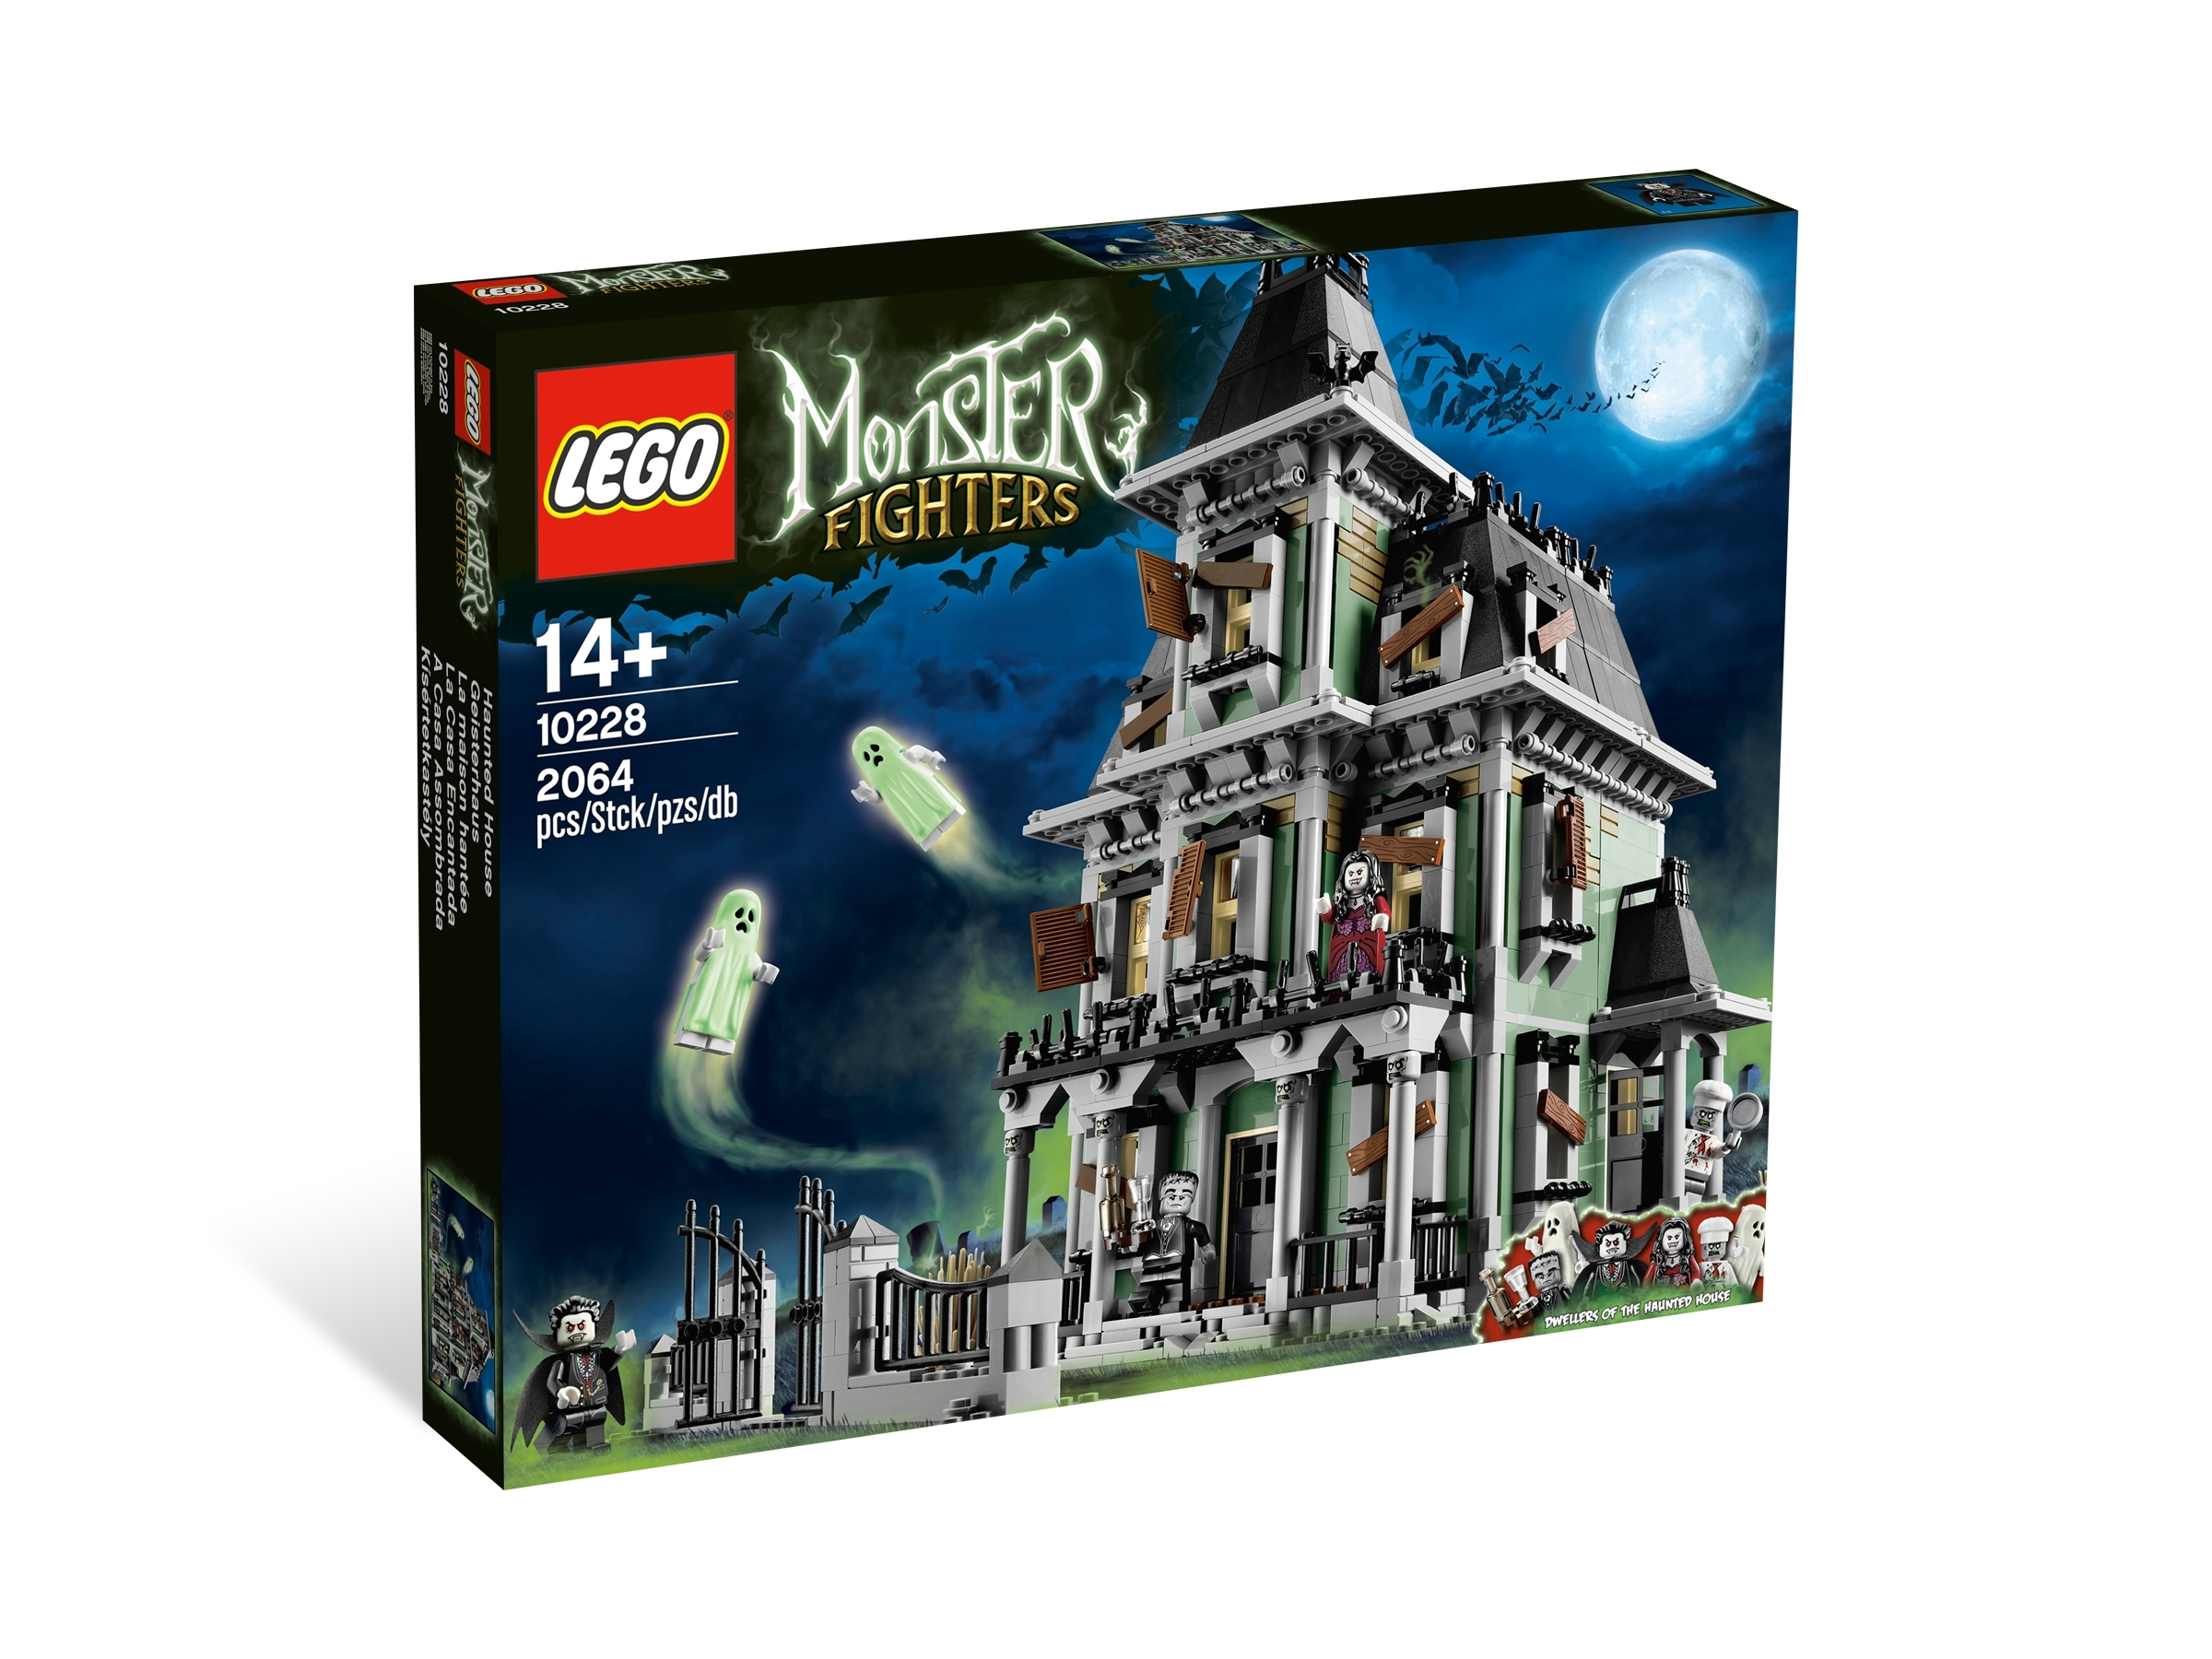 LEGO Lot of 12 Black 1x4 Basic Building Bricks